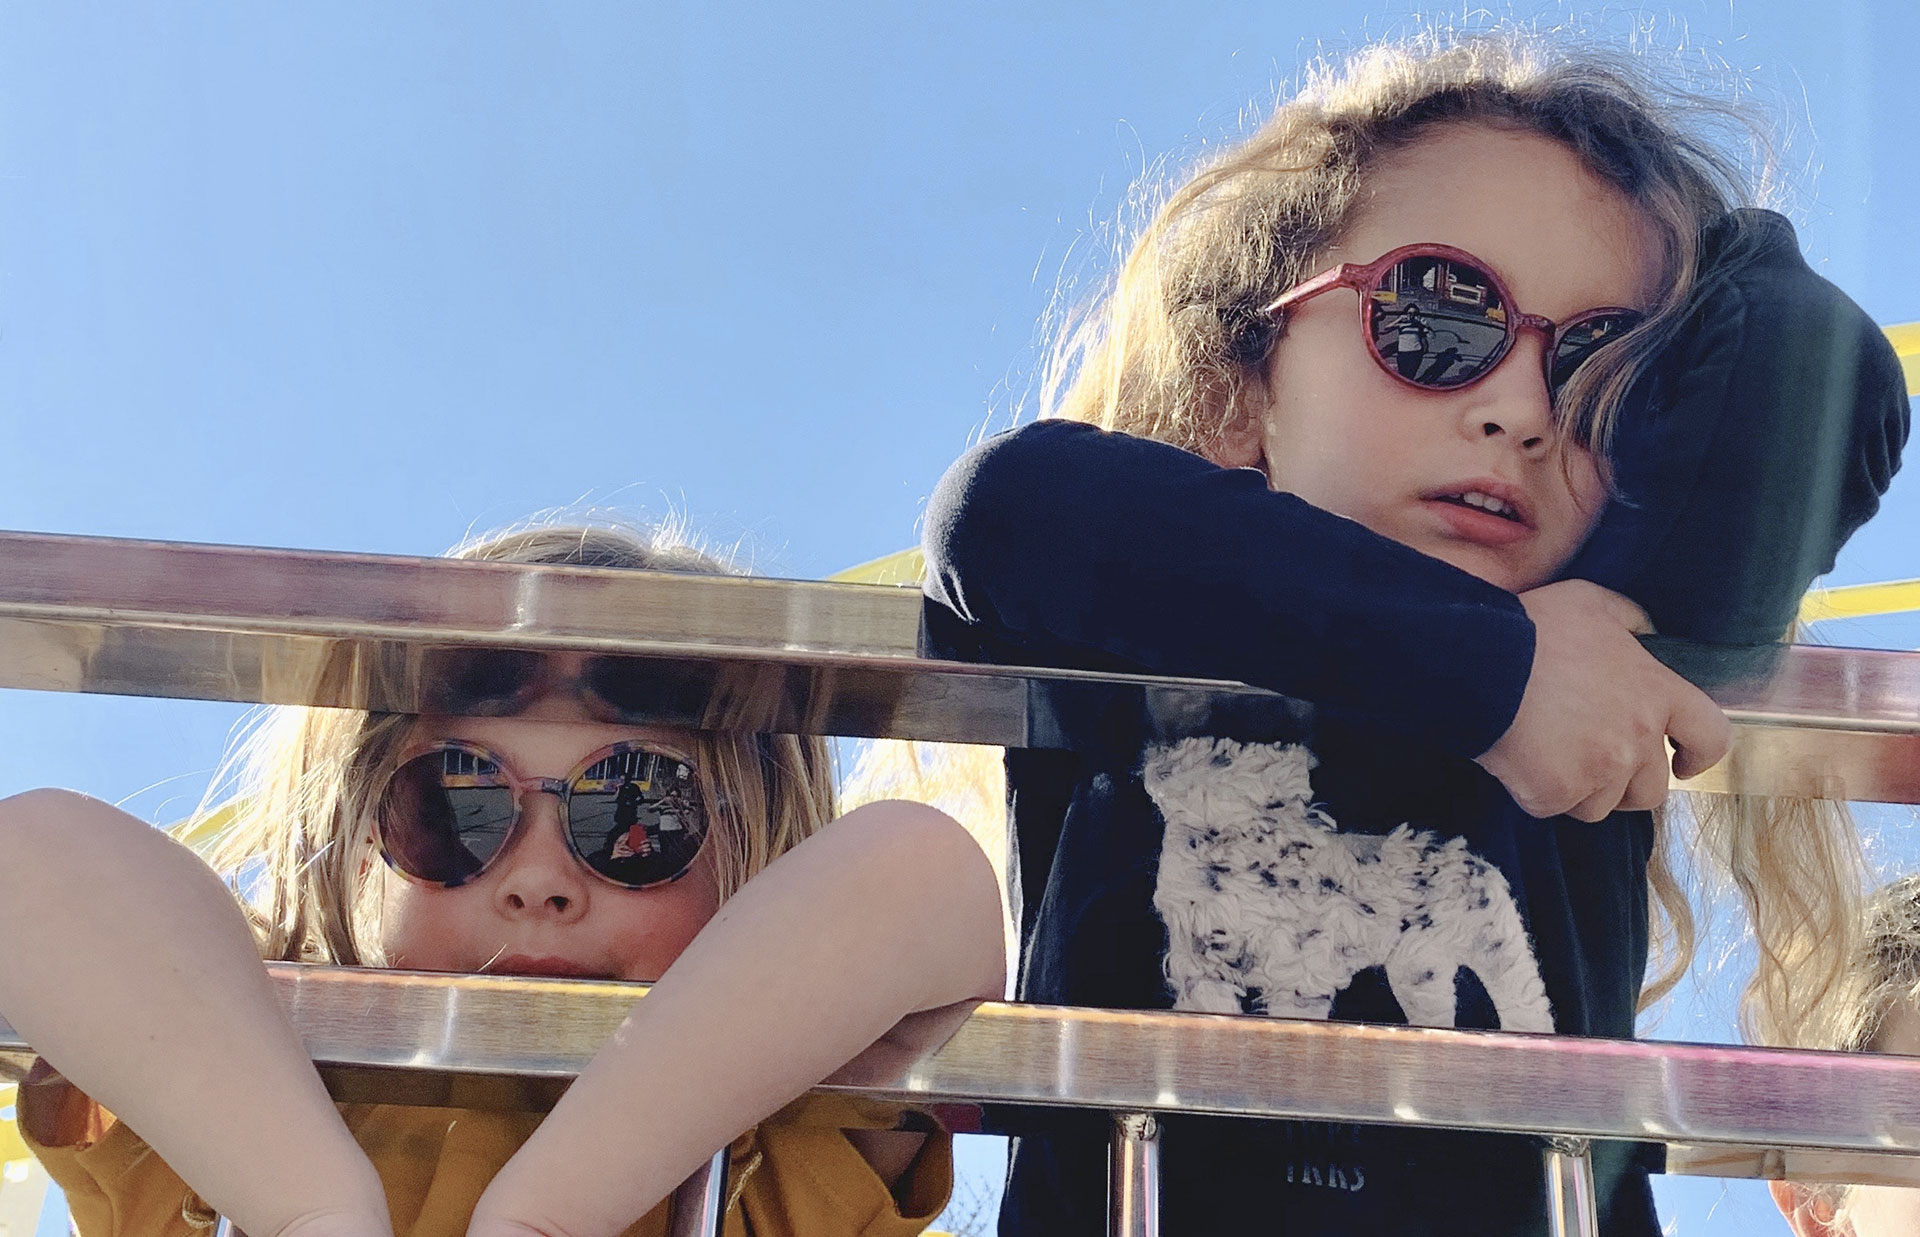 jfkids_outdoor_fun_Fd_Video